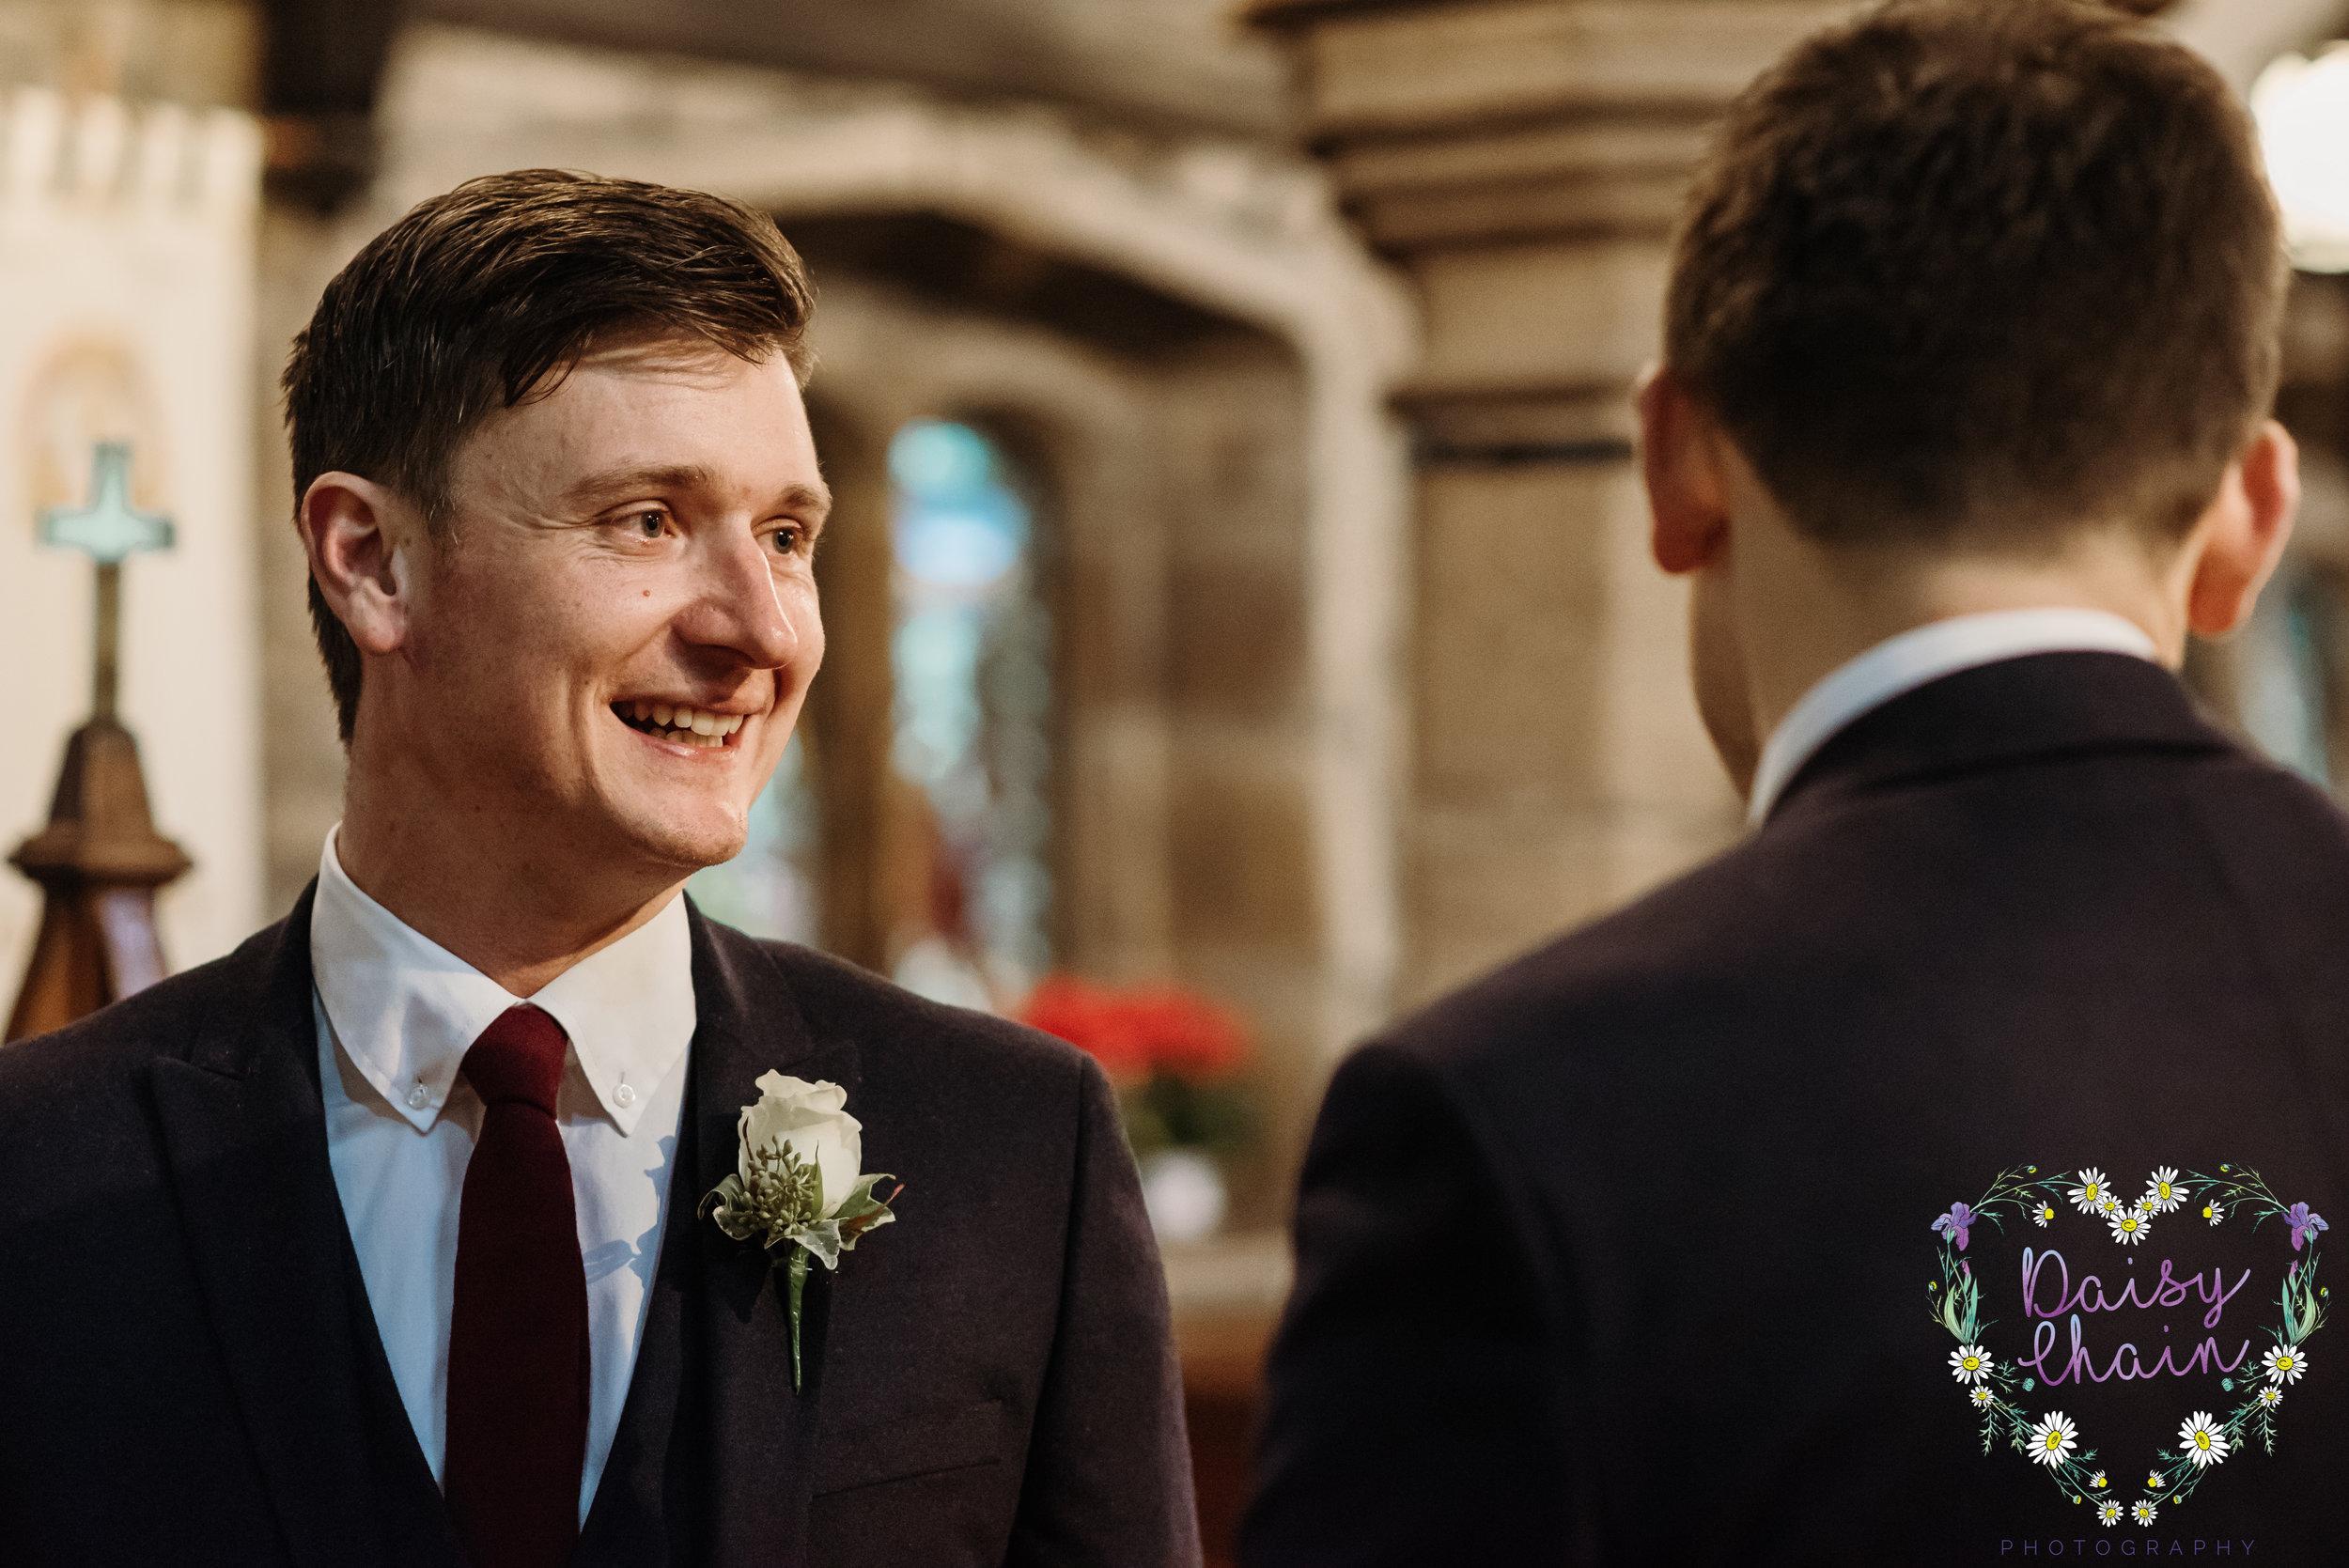 Lancashire groomsmen